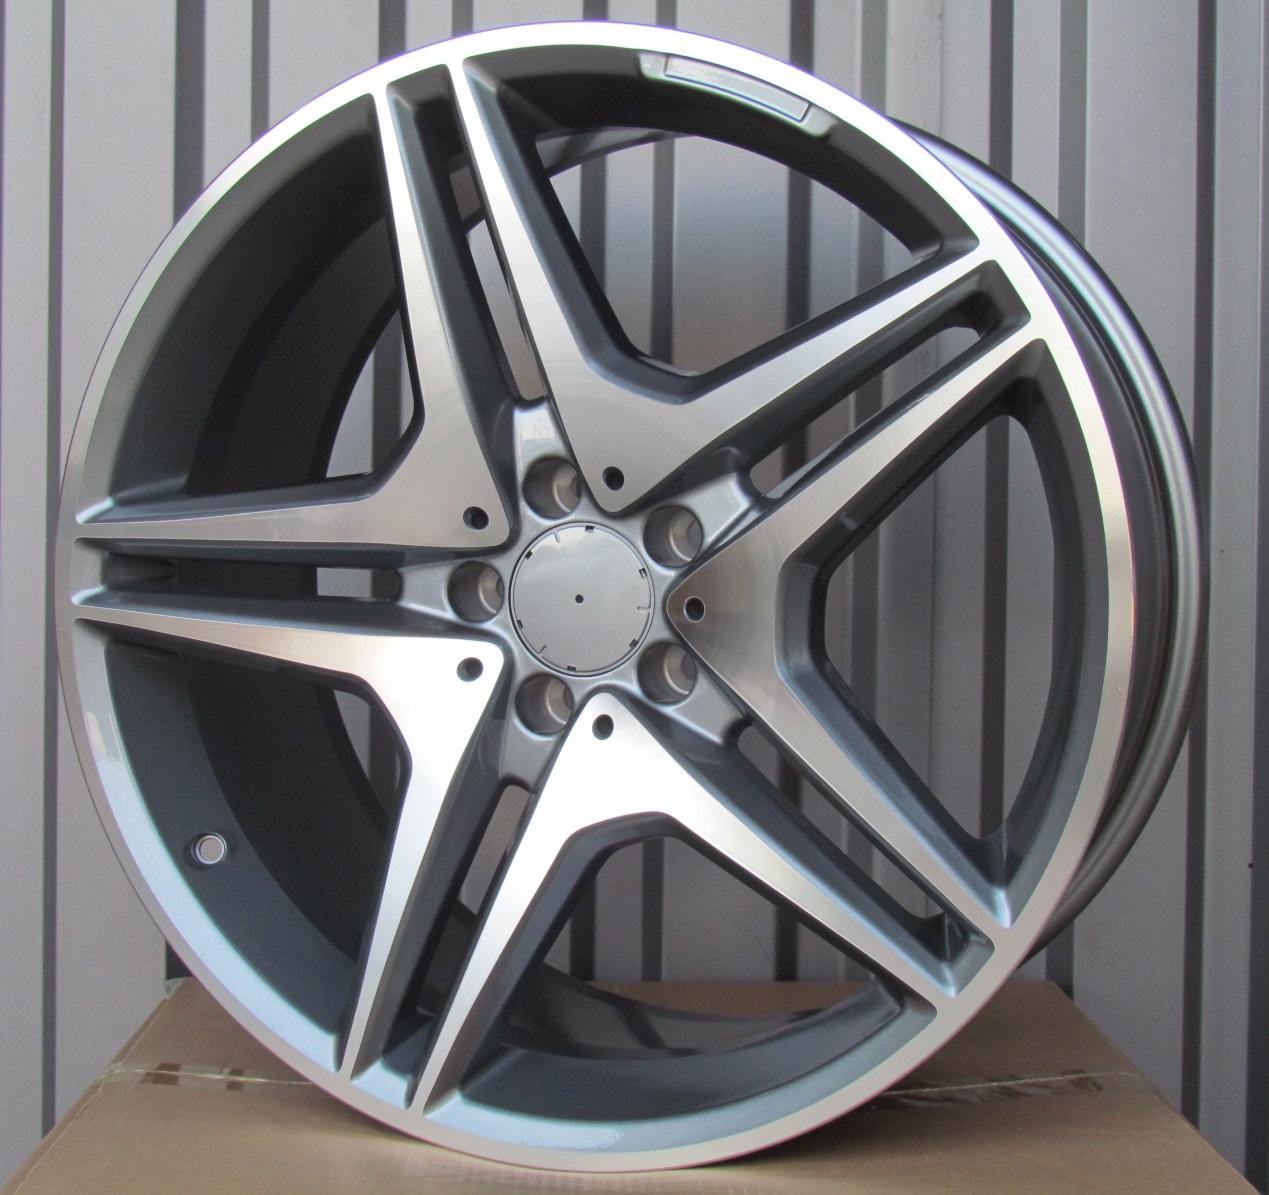 M20X9.5 5X112 ET43 66.6 XF555 MG (Rear+Front) RWR MER (K1+P) 9.5x20 ET41 5x112